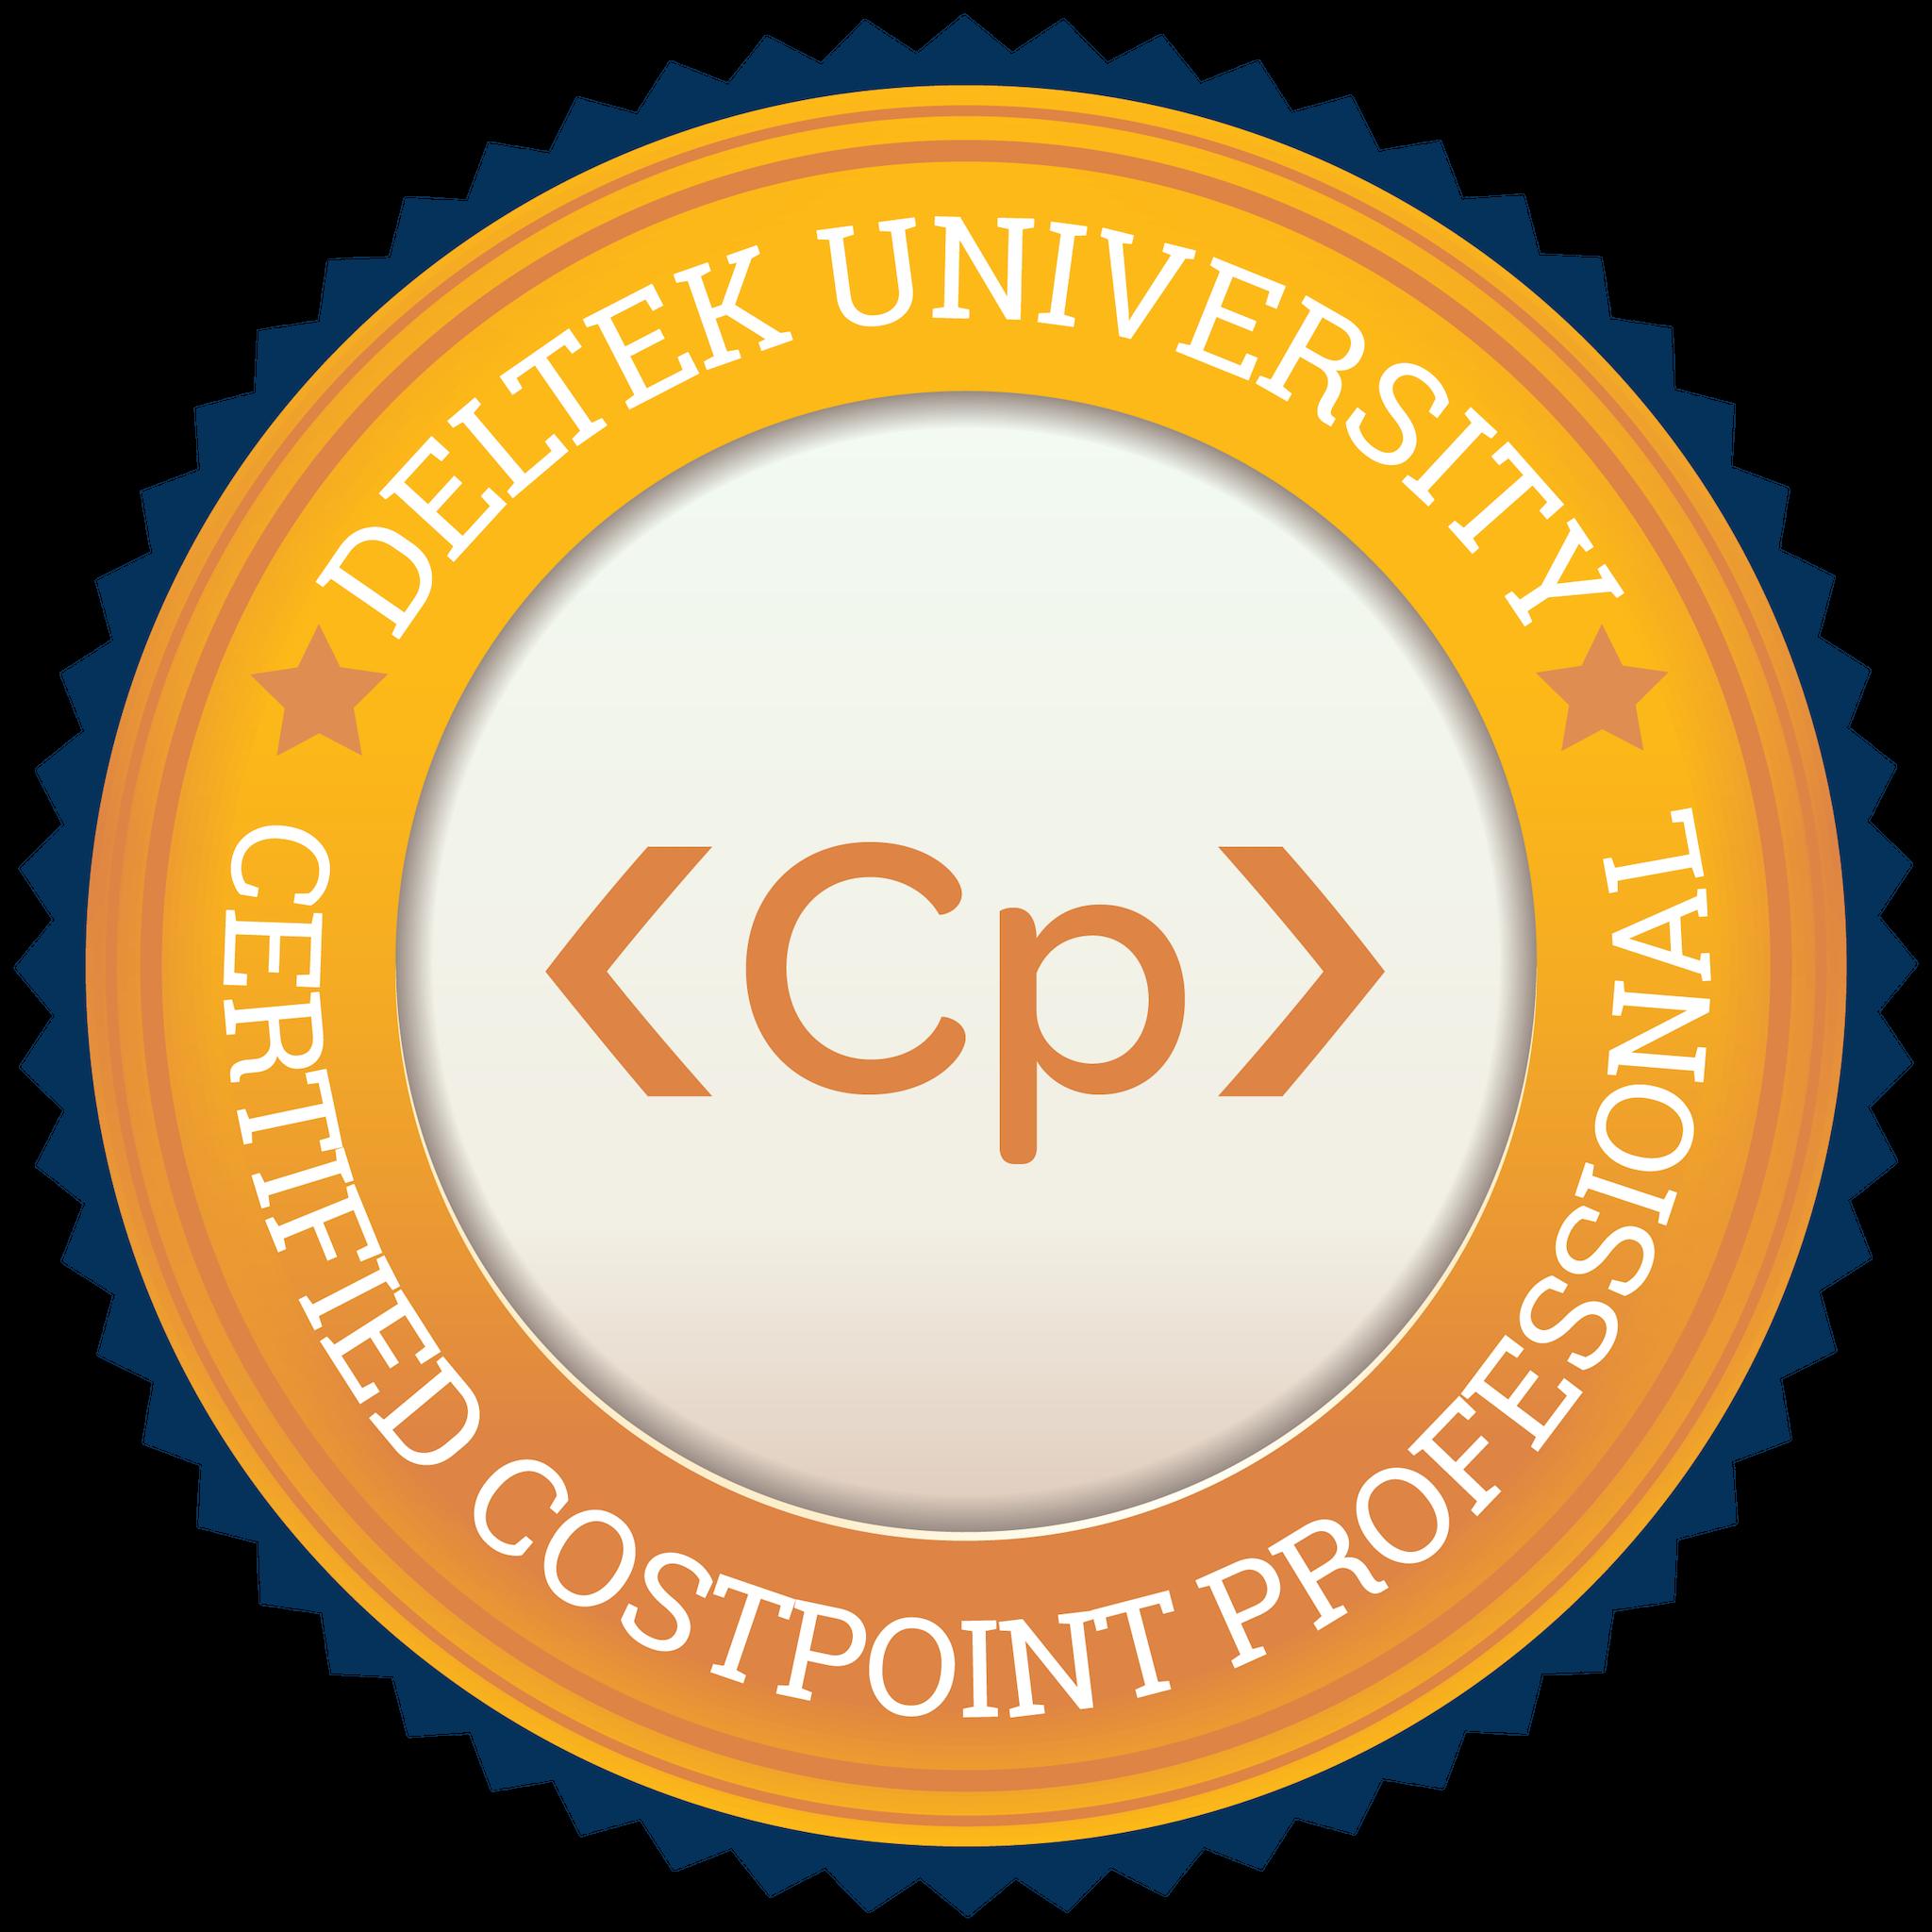 Costpoint Master Certification Exam